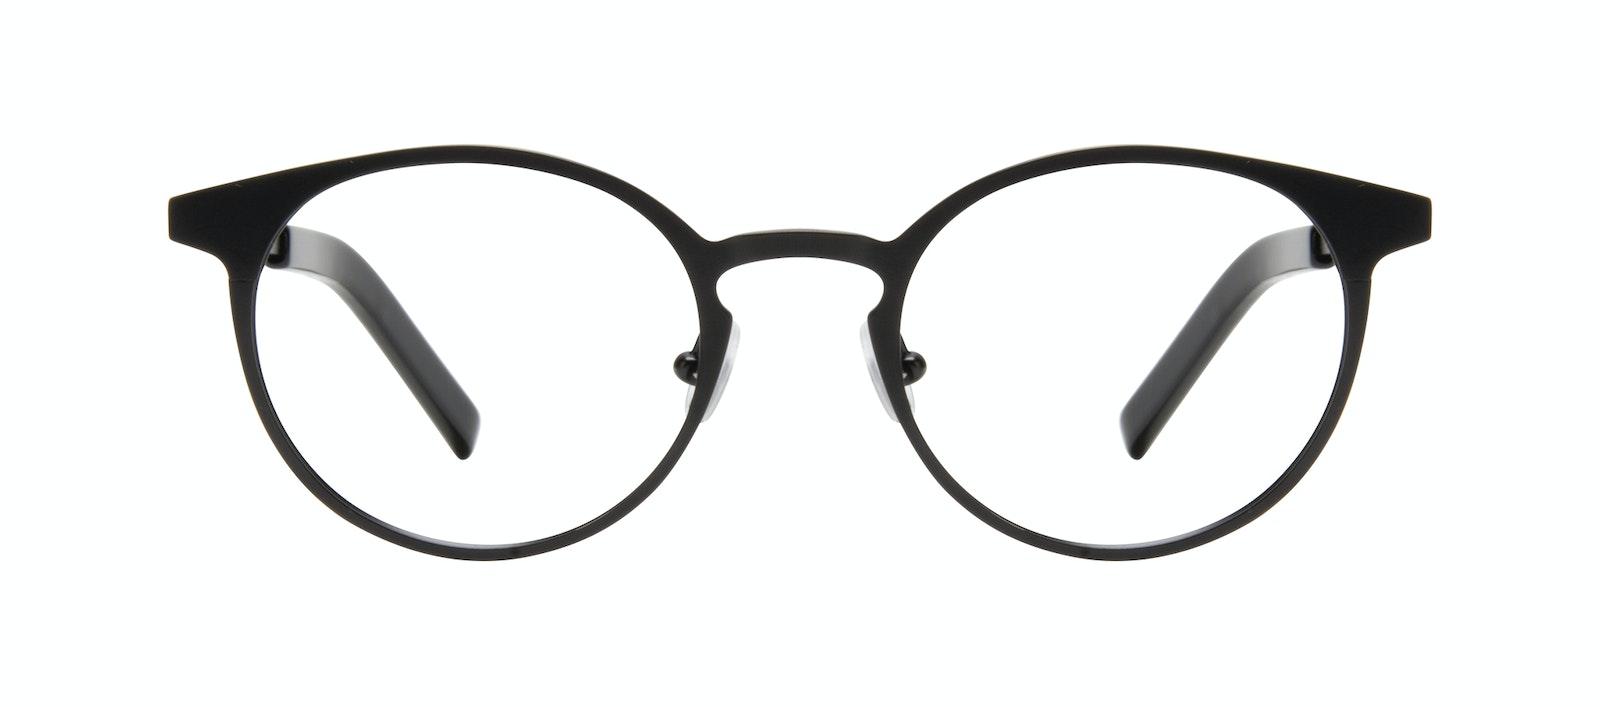 Affordable Fashion Glasses Round Eyeglasses Men Cut Onyx Matte Front